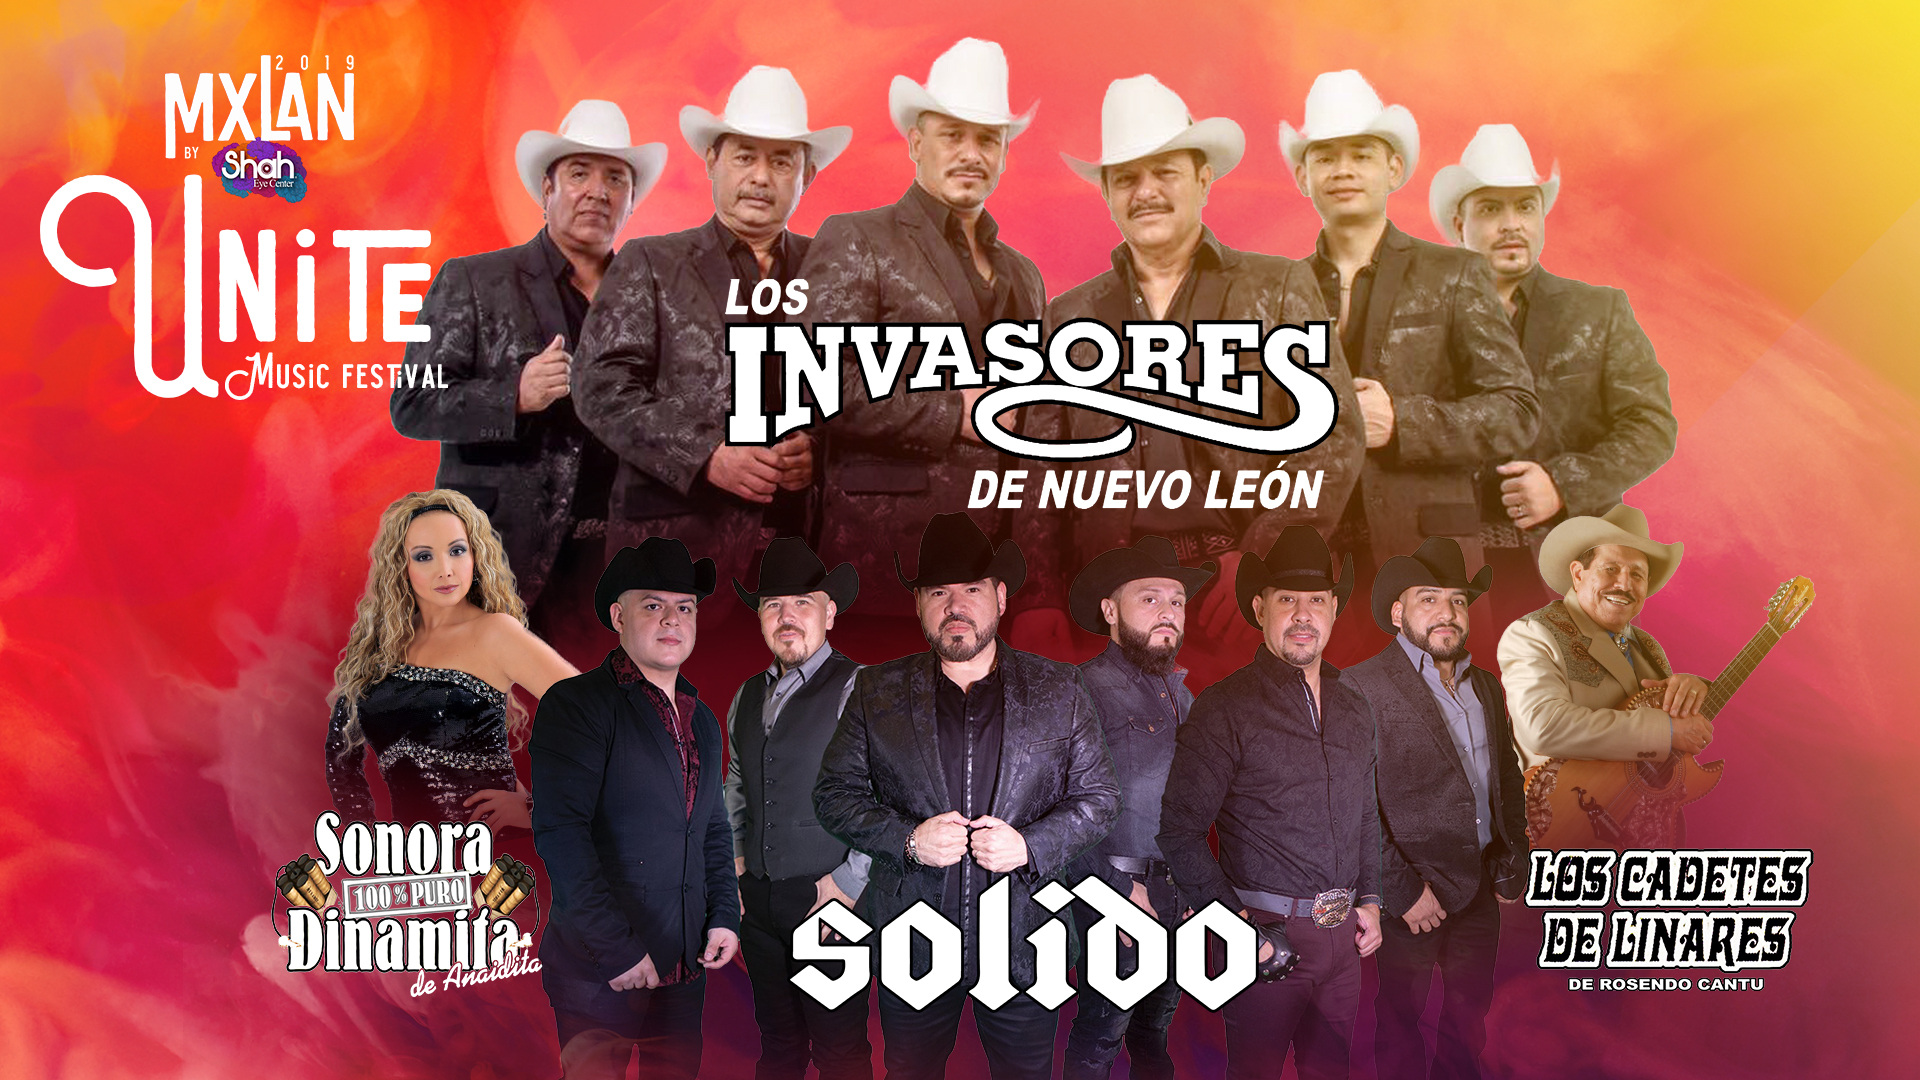 mxlan unite music festival concerts mcallen festival border music calenda parade vacation texas san antonio south padre island